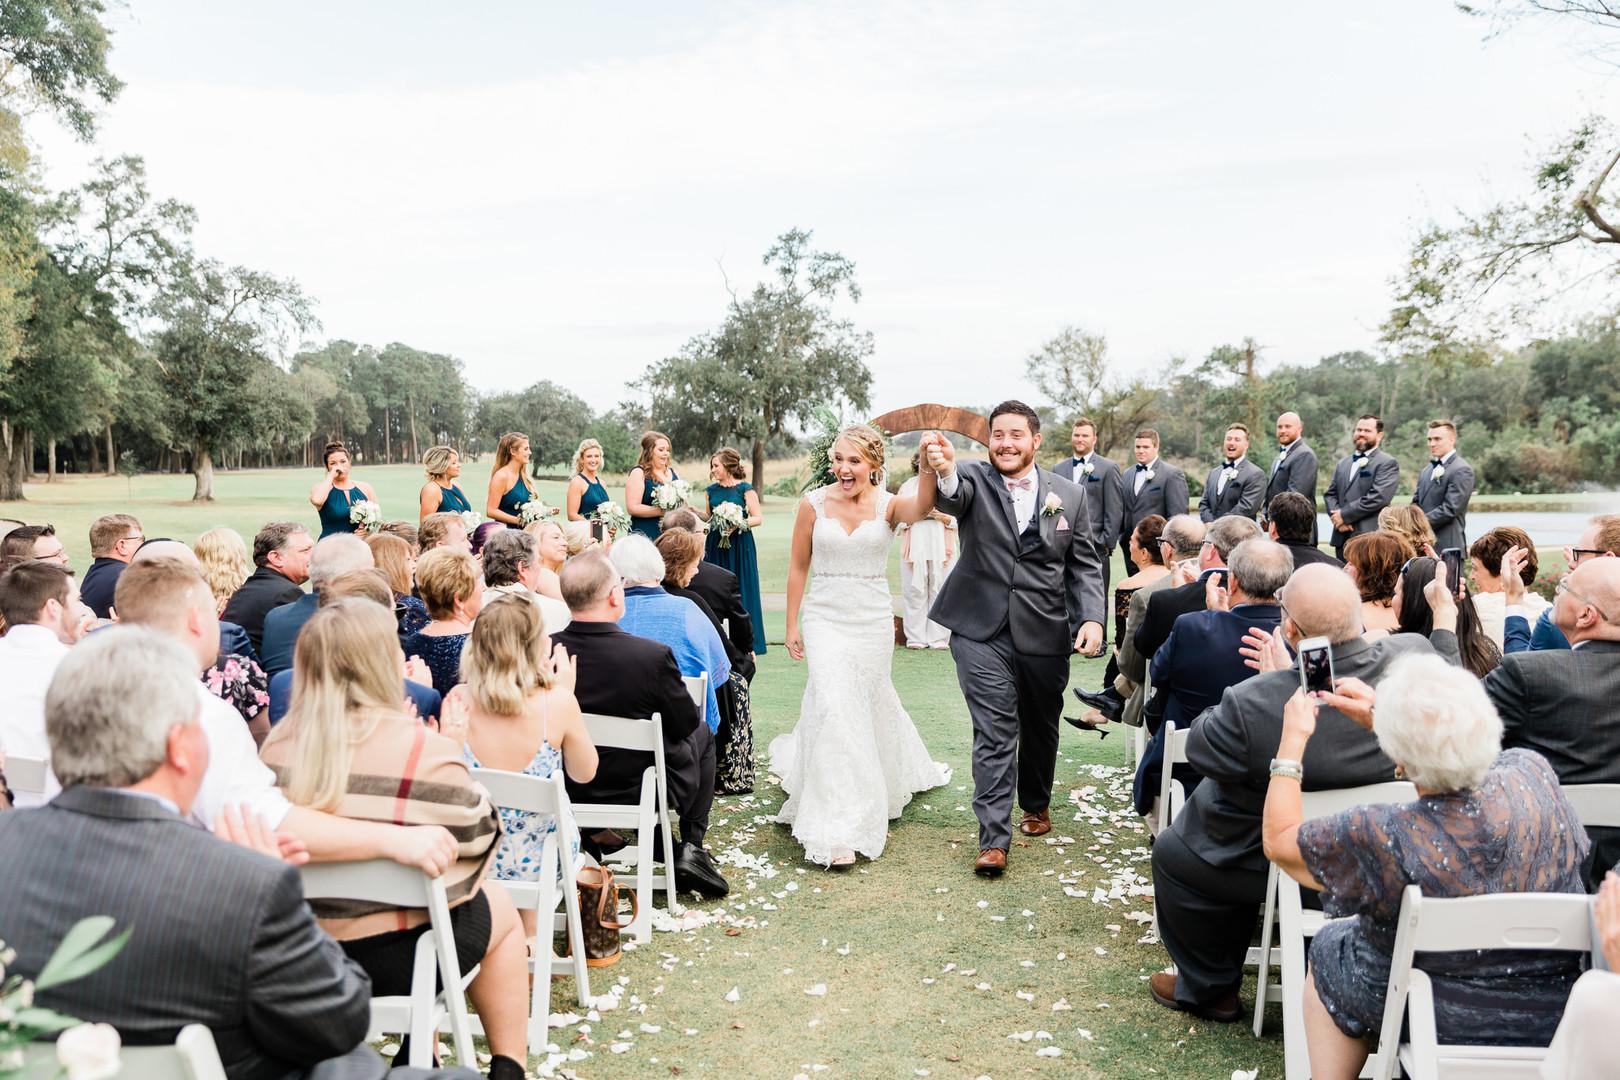 pawleys-plantation-wedding-17.jpg